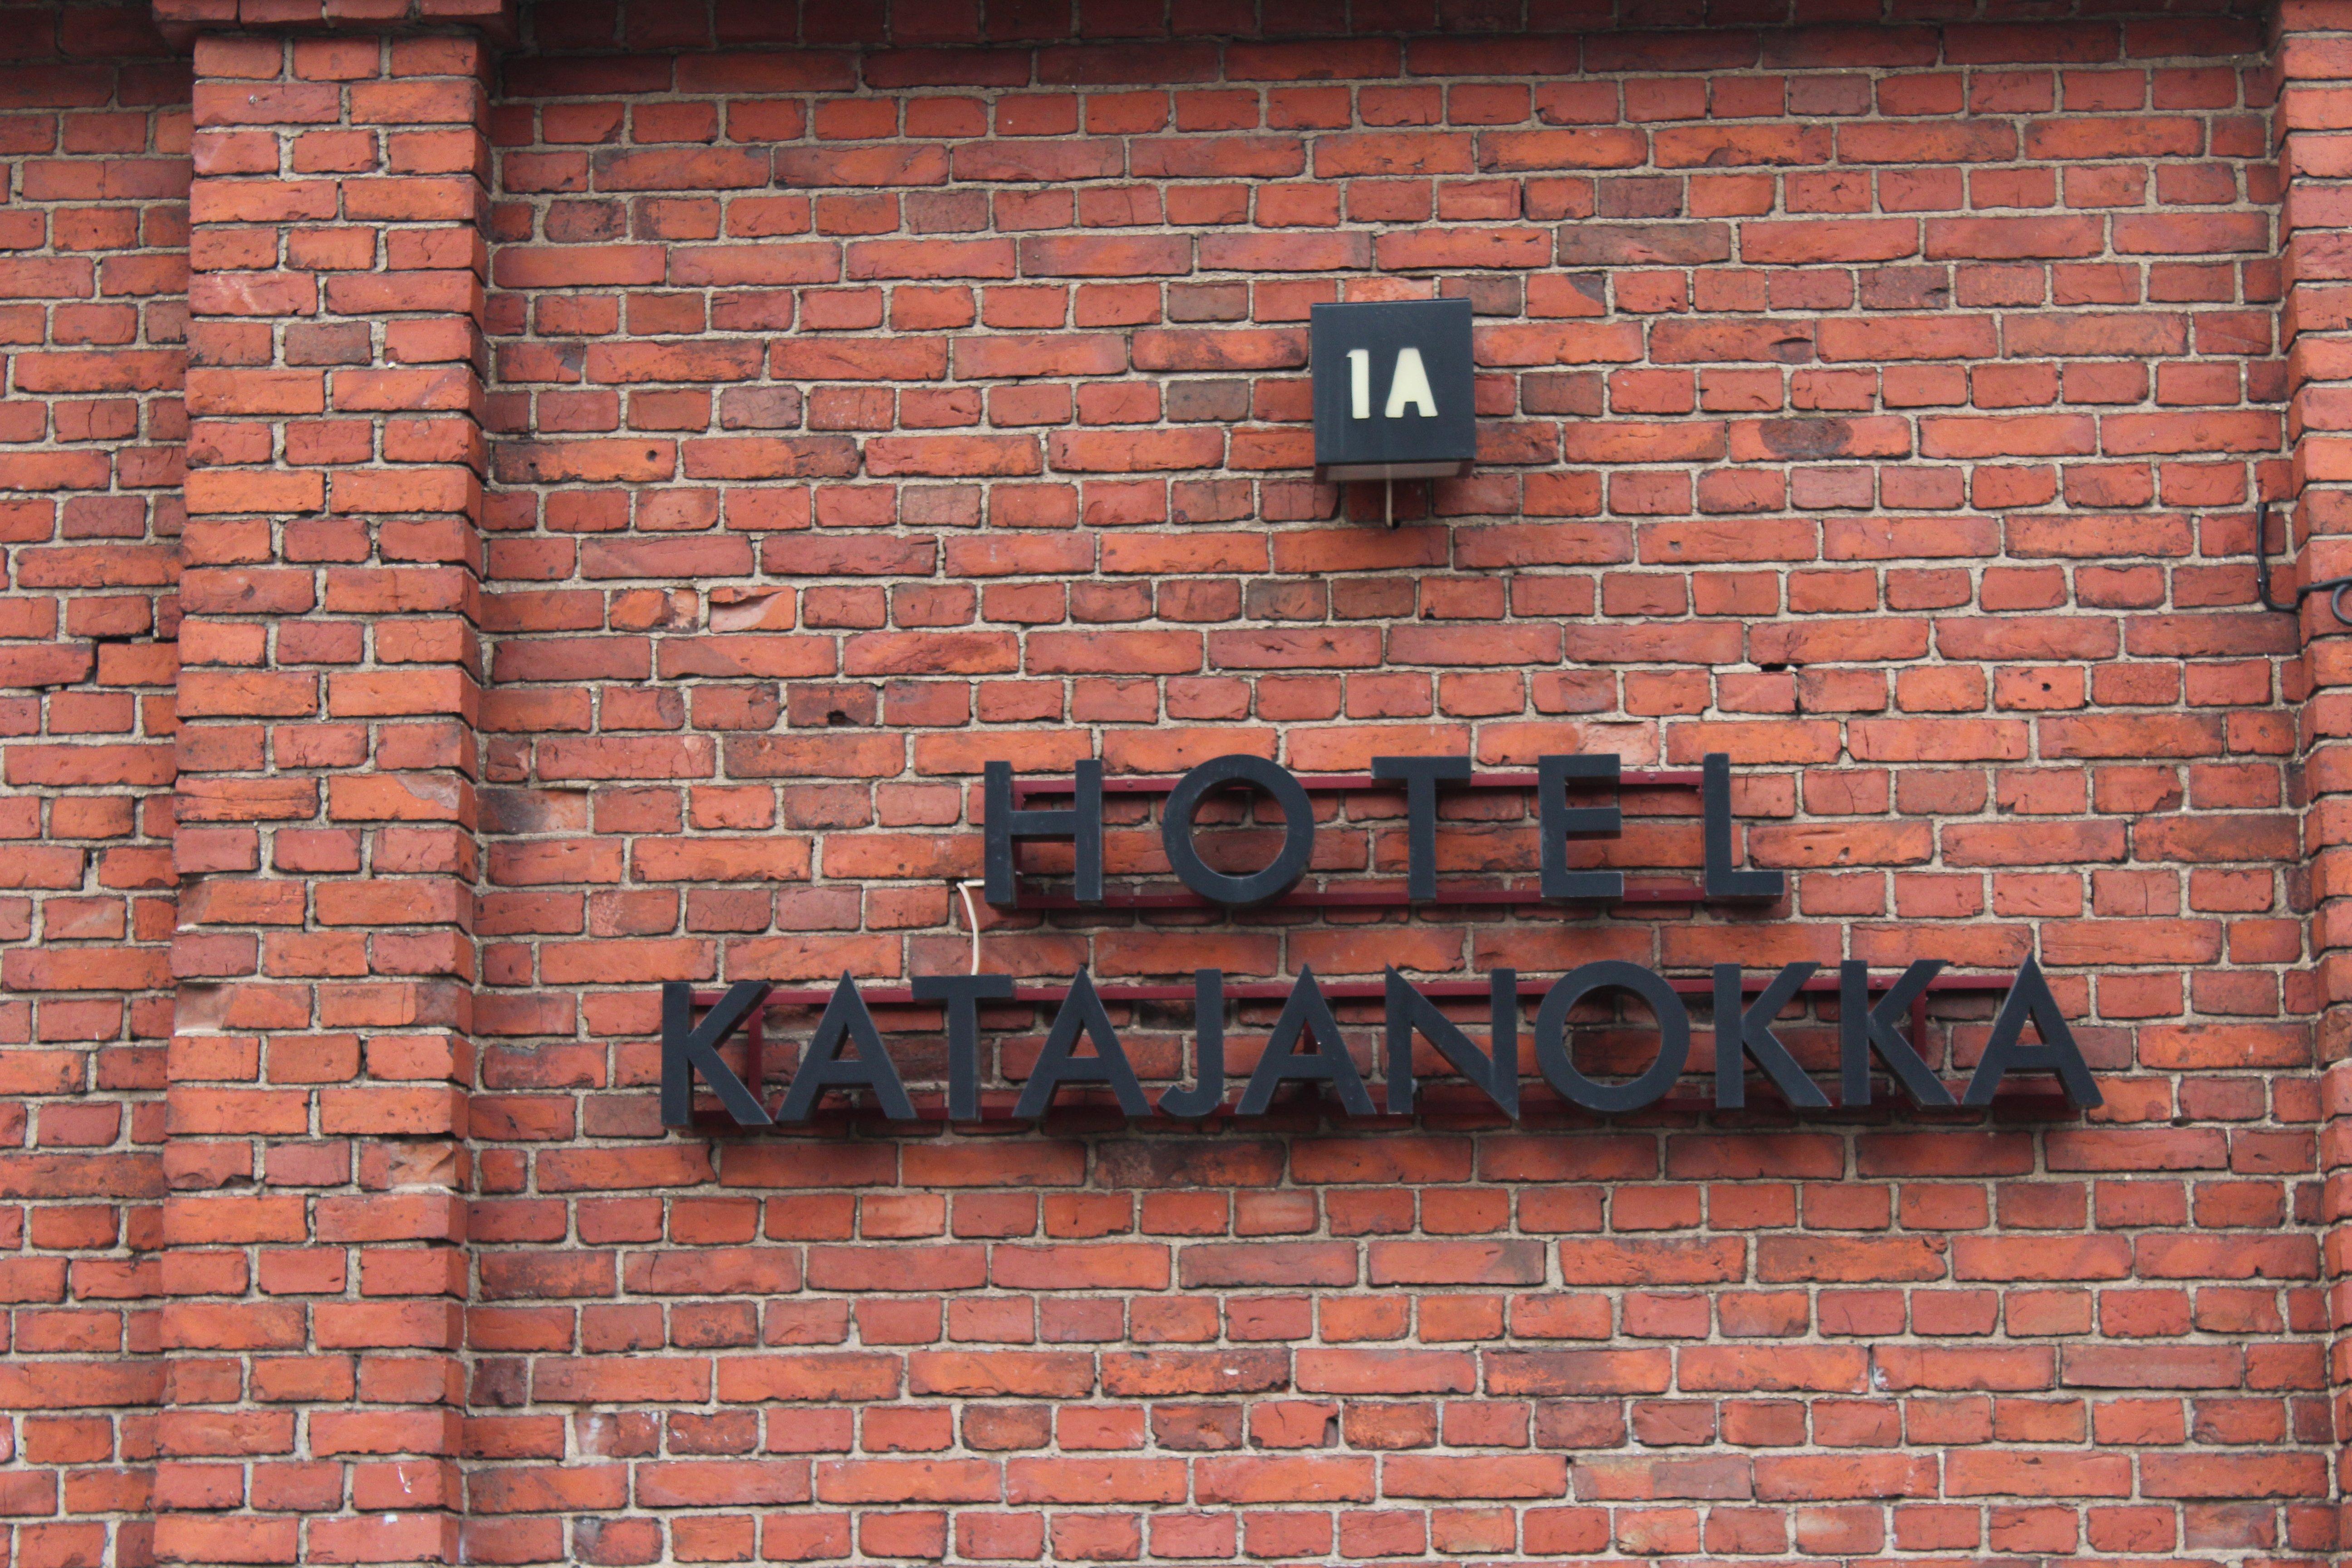 mur-hotel-katajanokka